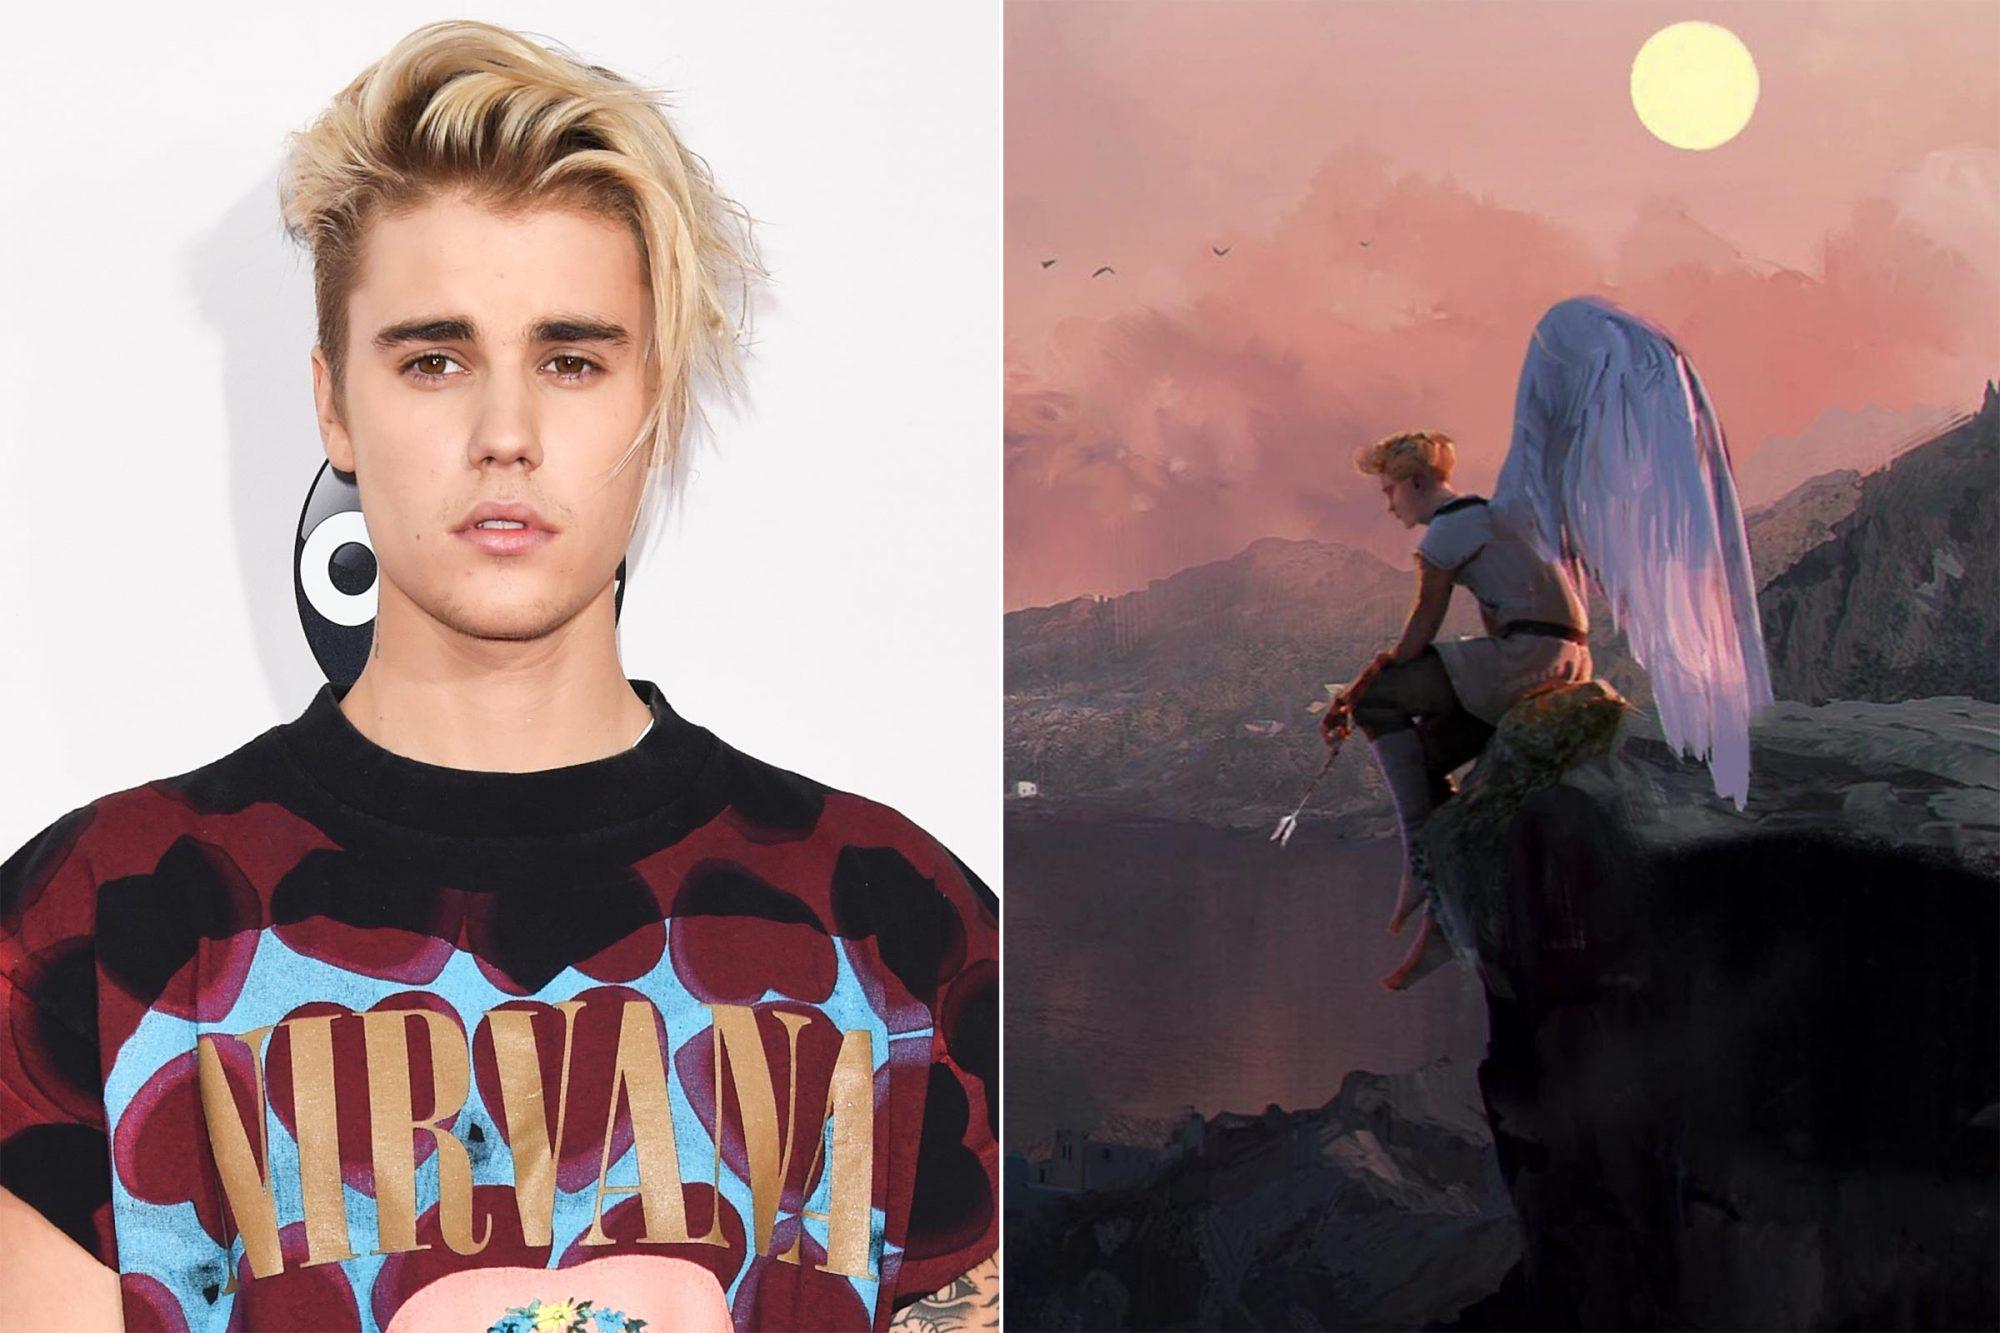 Justin Bieber / Cupid